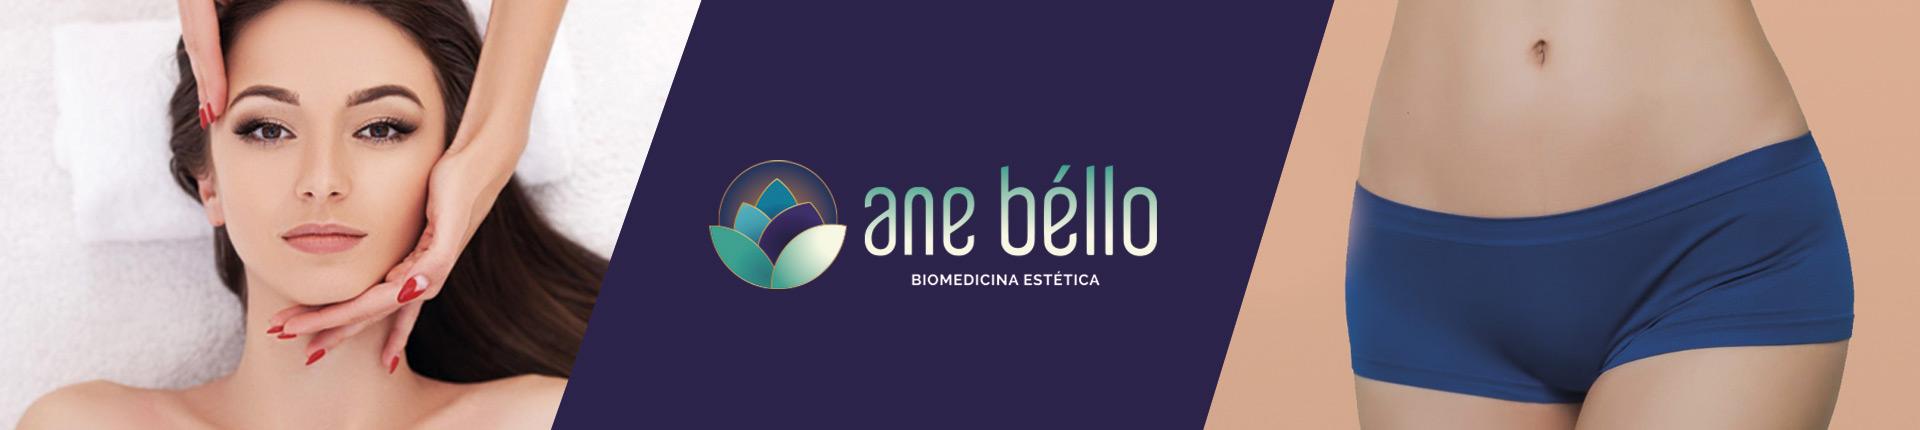 Ane Bello Biomedicina Estética